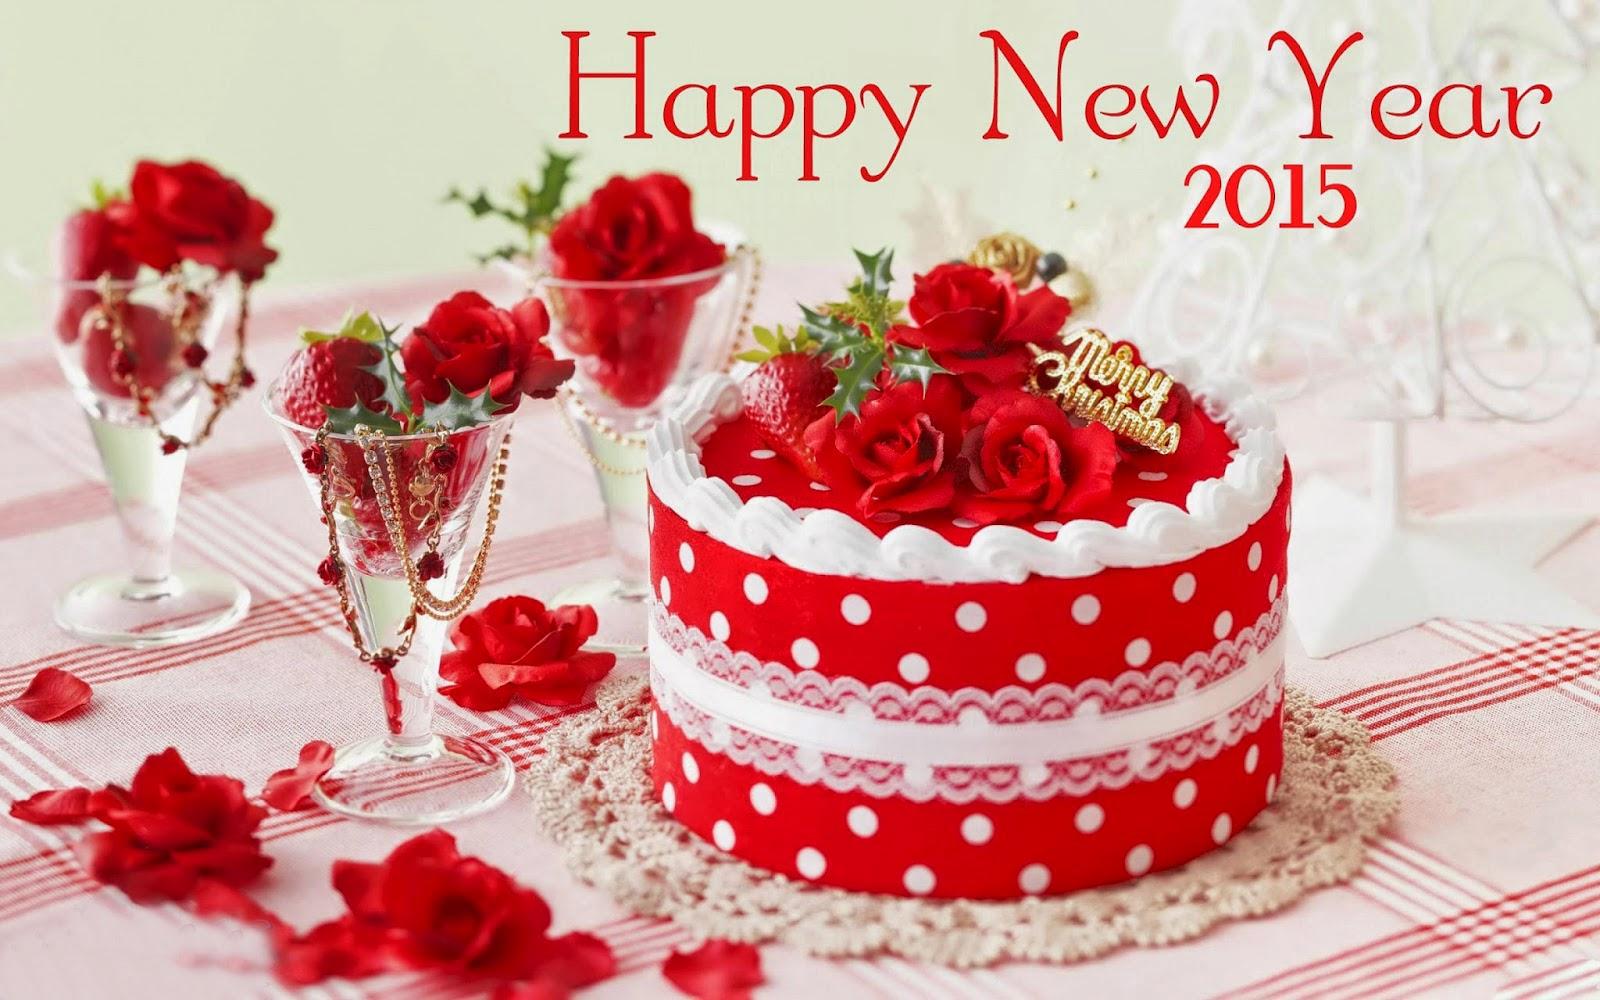 Happy New Year 2015 Wallpaper Love